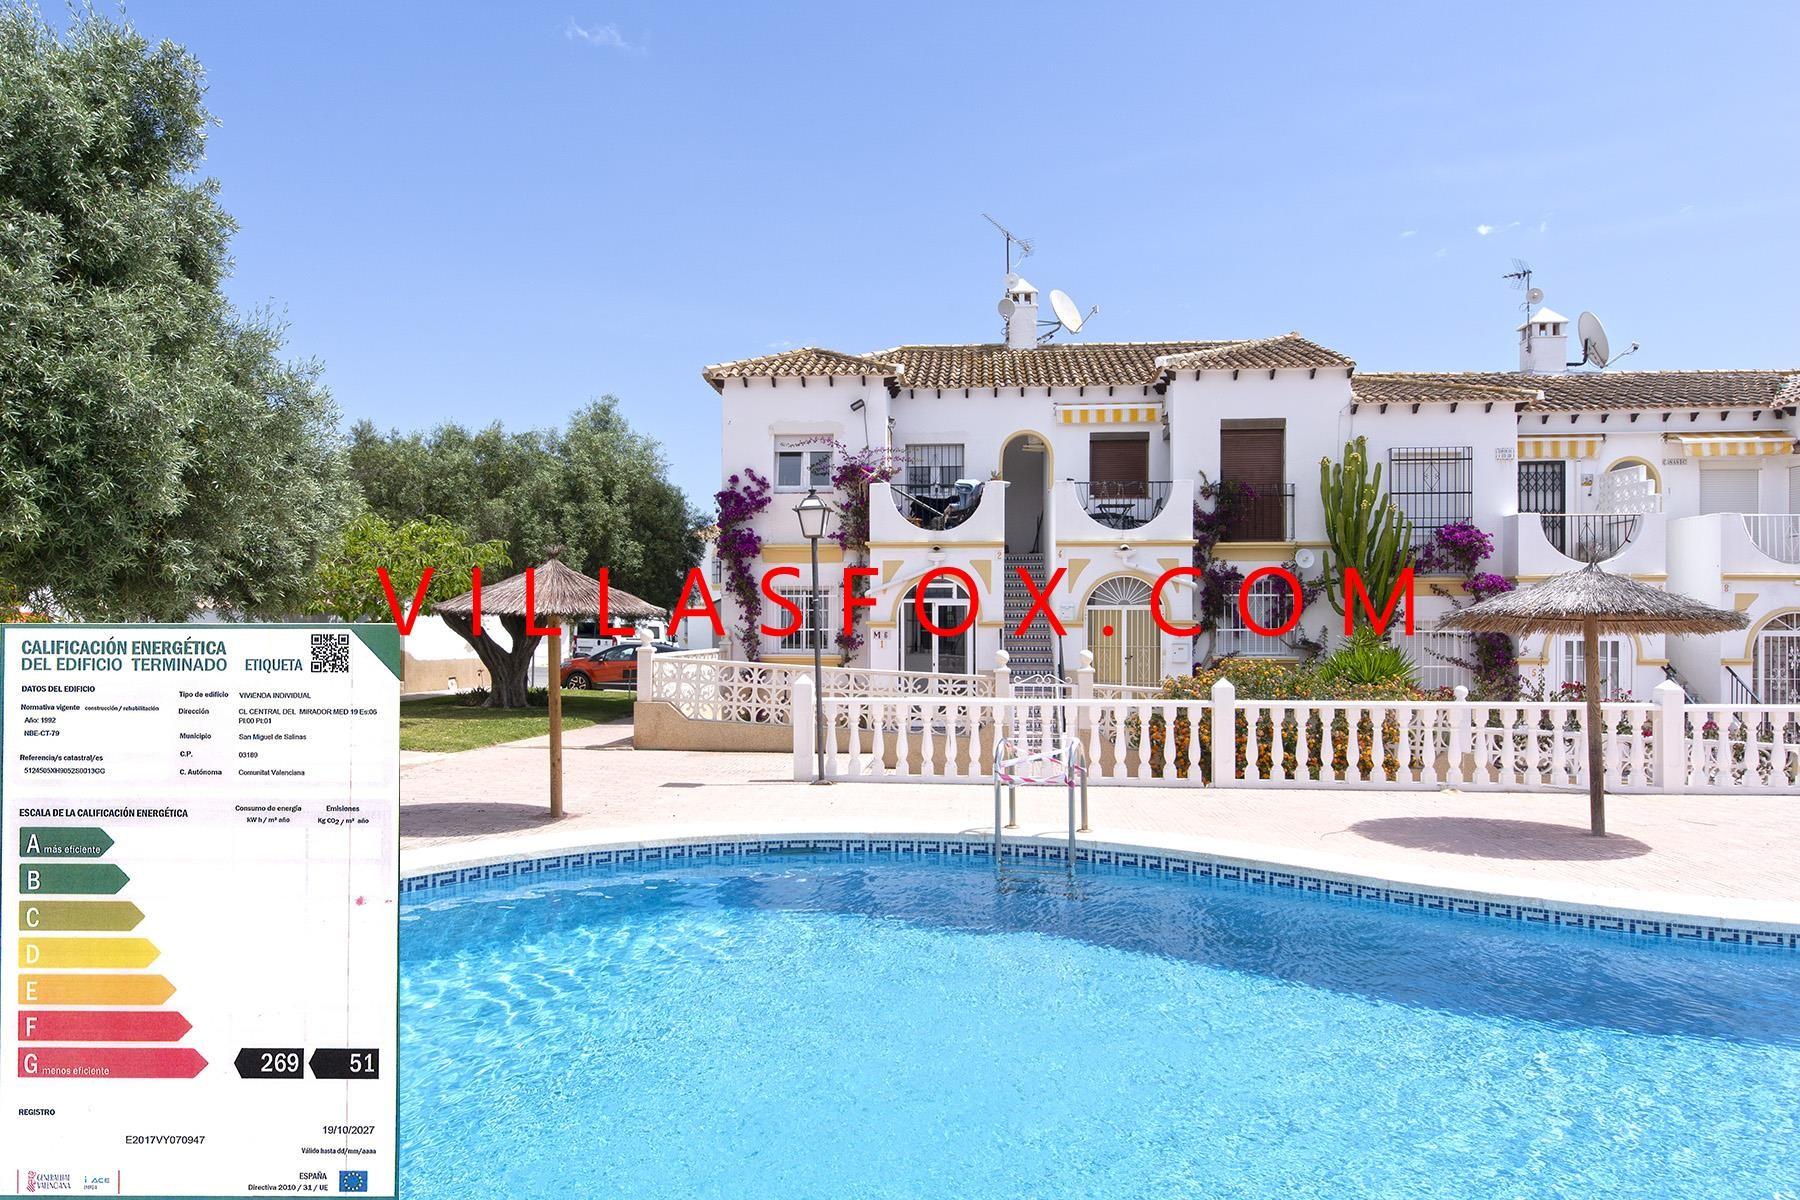 Mirador del Mediterraneo large 1-bedroom ground-floor apartment with garden